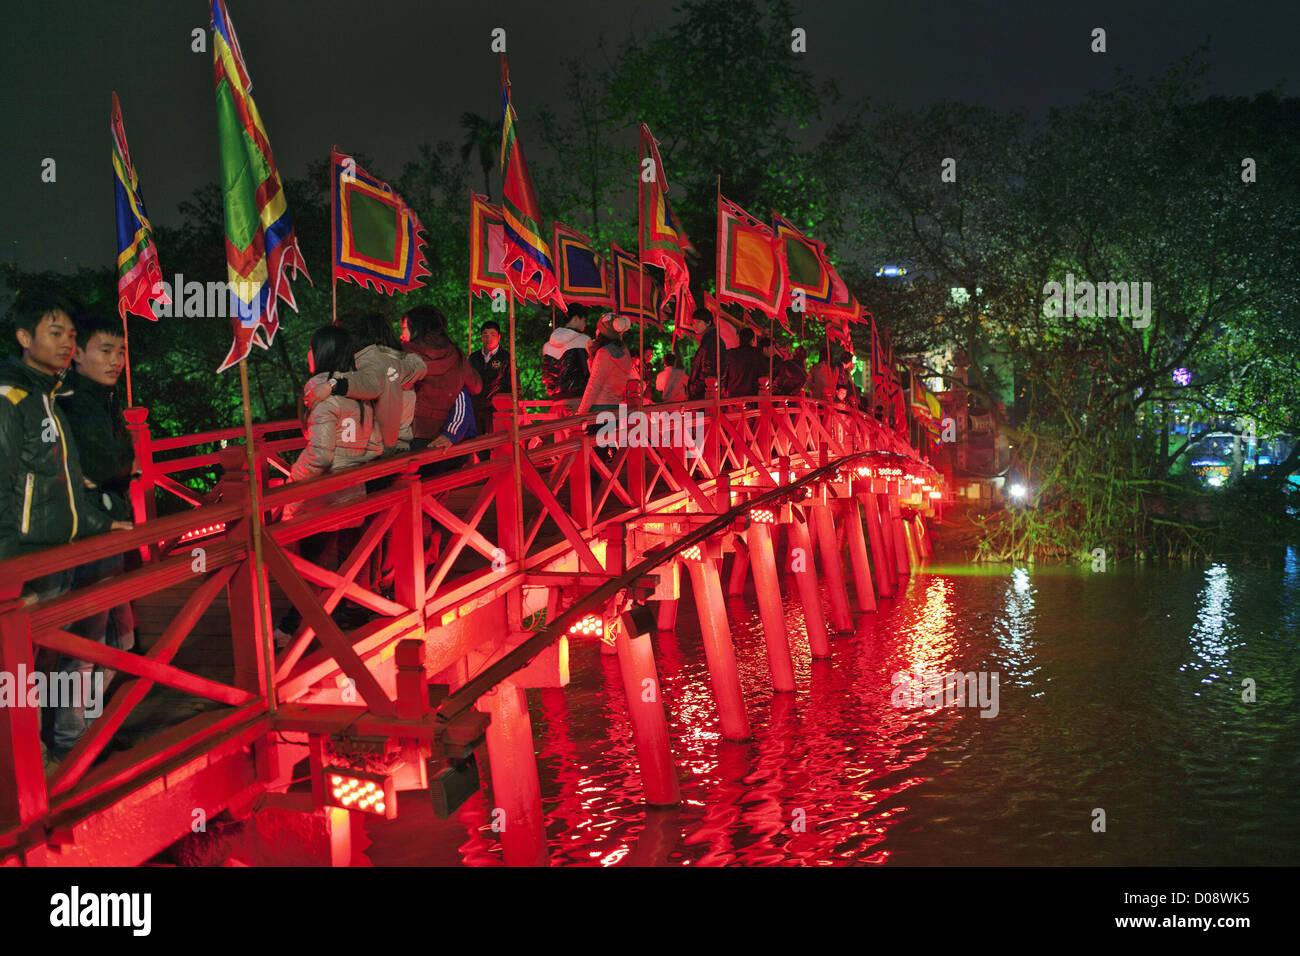 BRIDGE OF THE RISING SUN THE RED HUC BRIDGE OVER HOAN KIEM LAKE HANOI VIETNAM ASIA - Stock Image